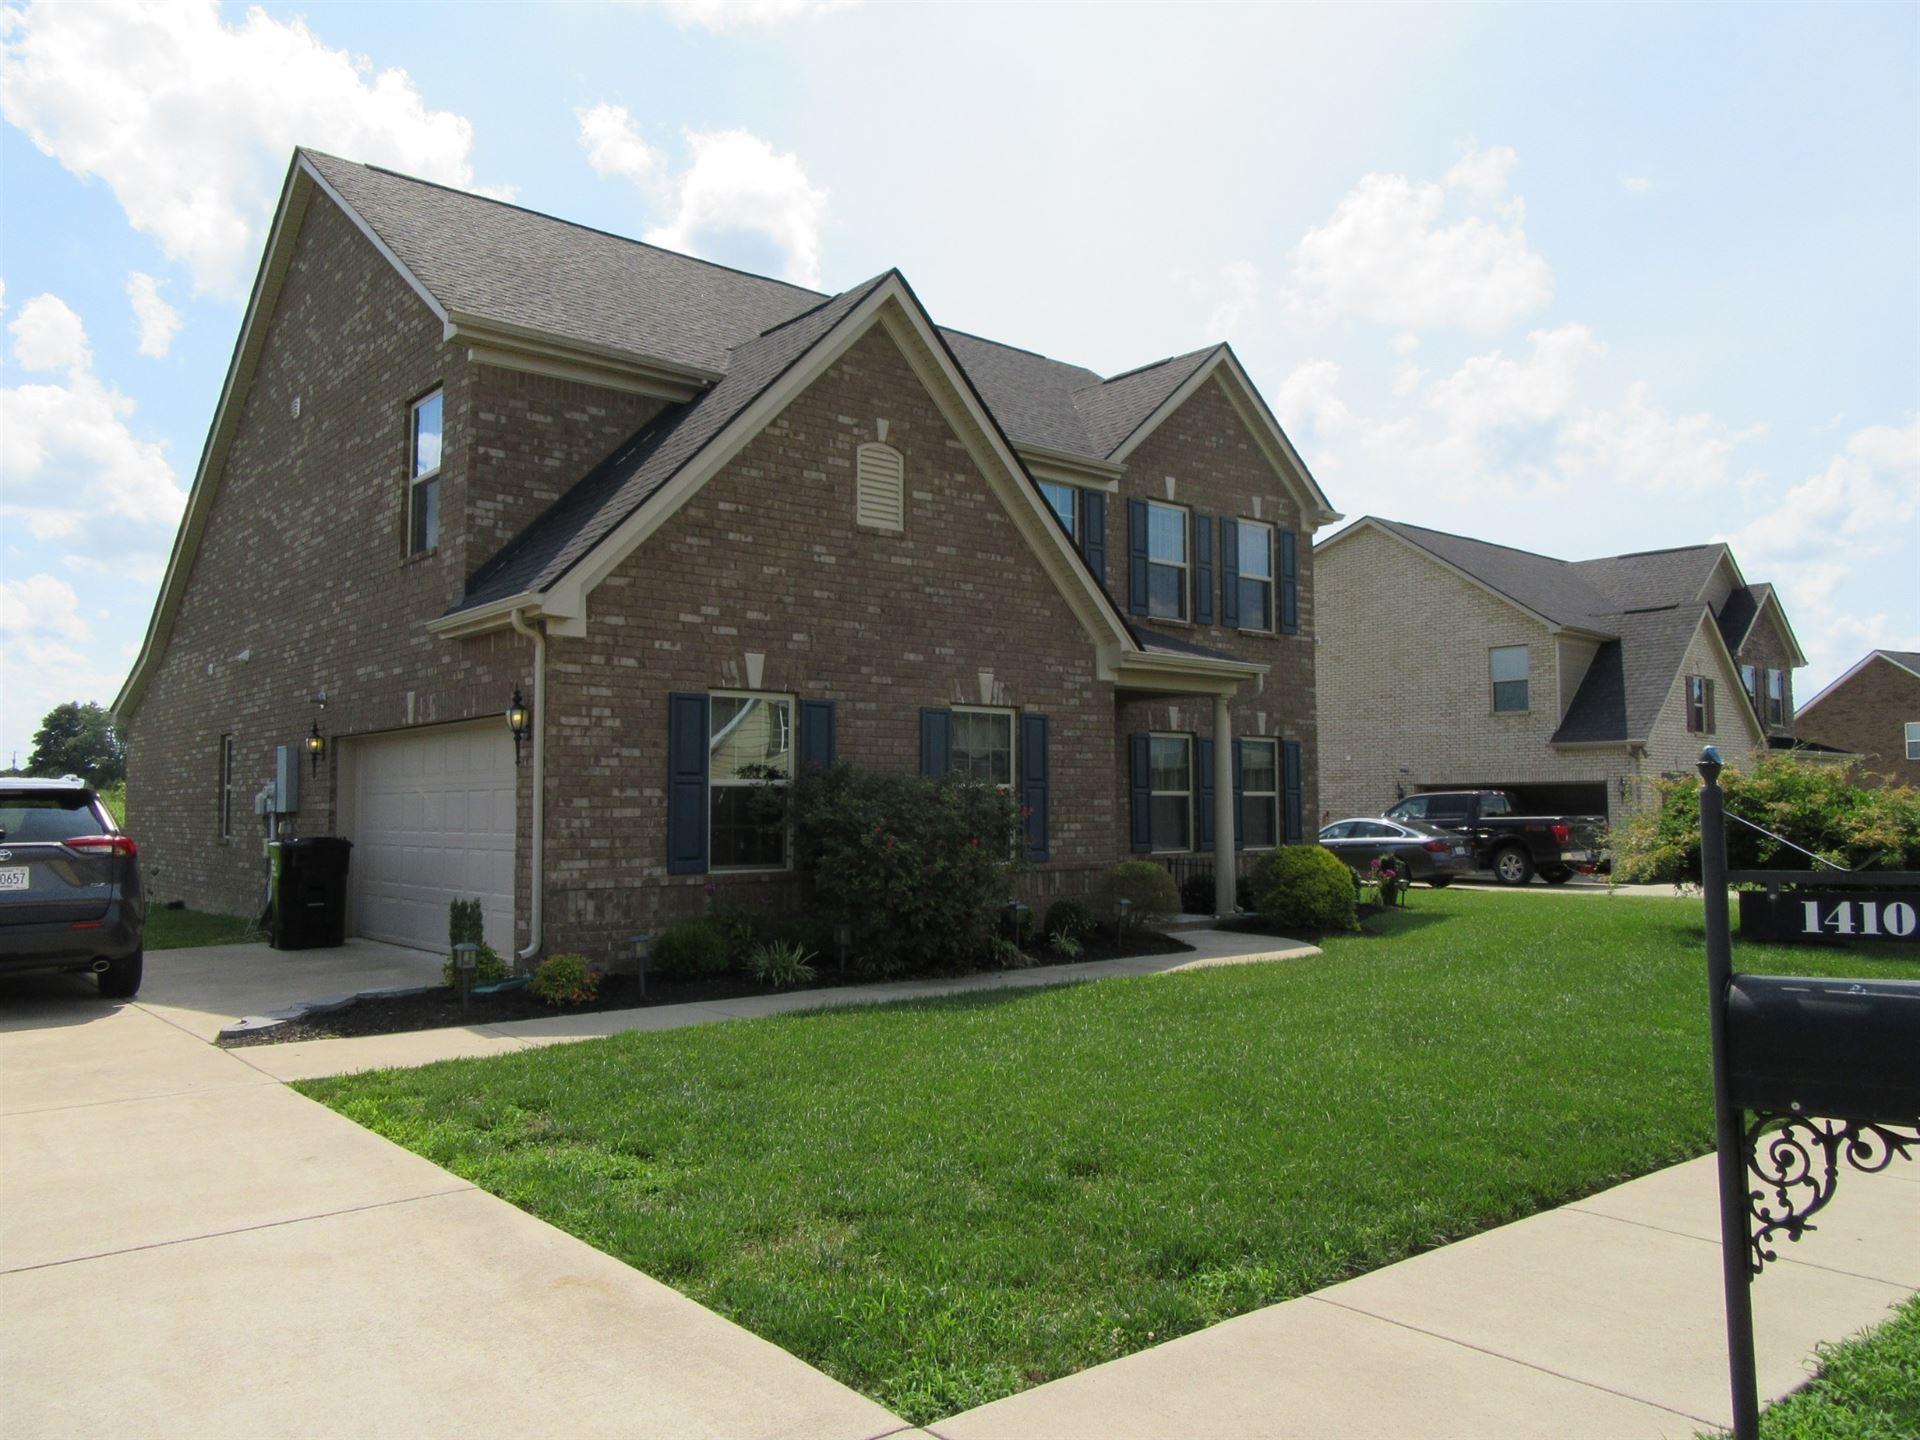 Photo of 1410 Oak Dr, Murfreesboro, TN 37128 (MLS # 2293191)